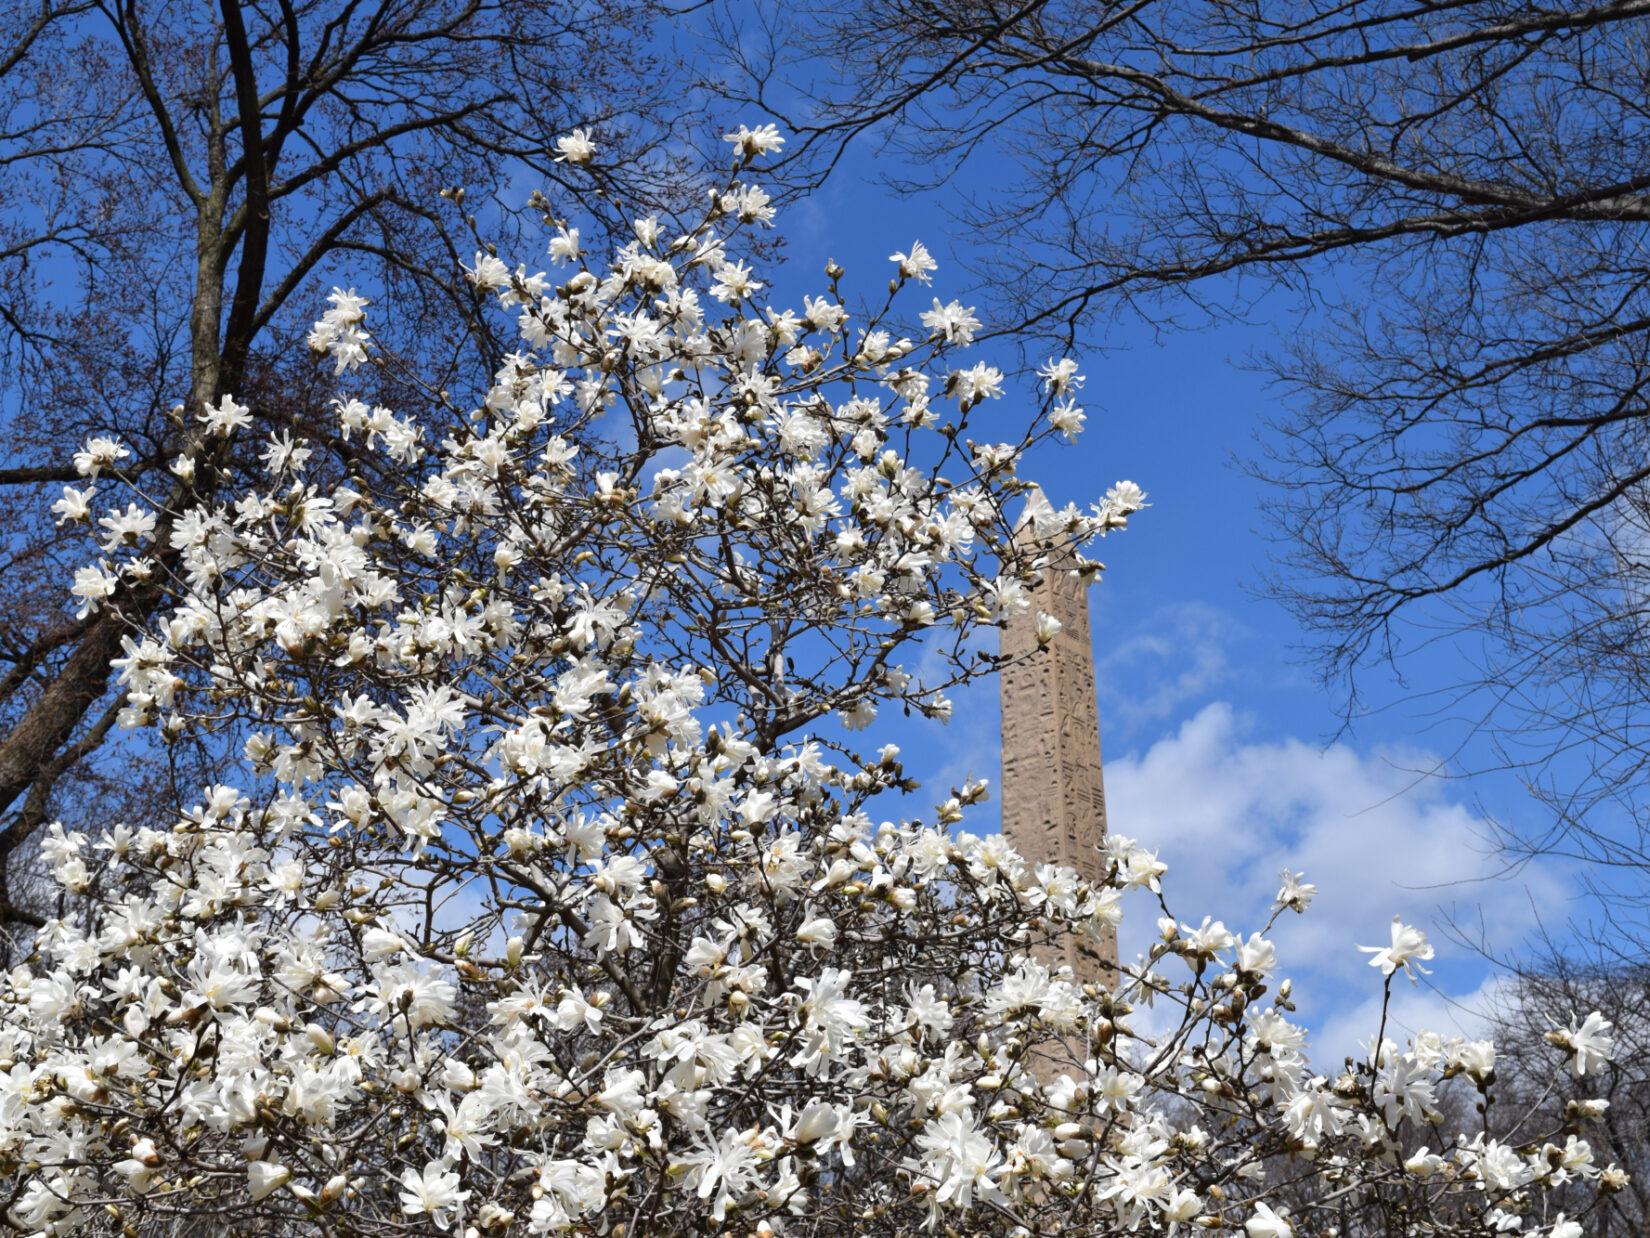 Obelisk and Magnolia Tree April 2018 02